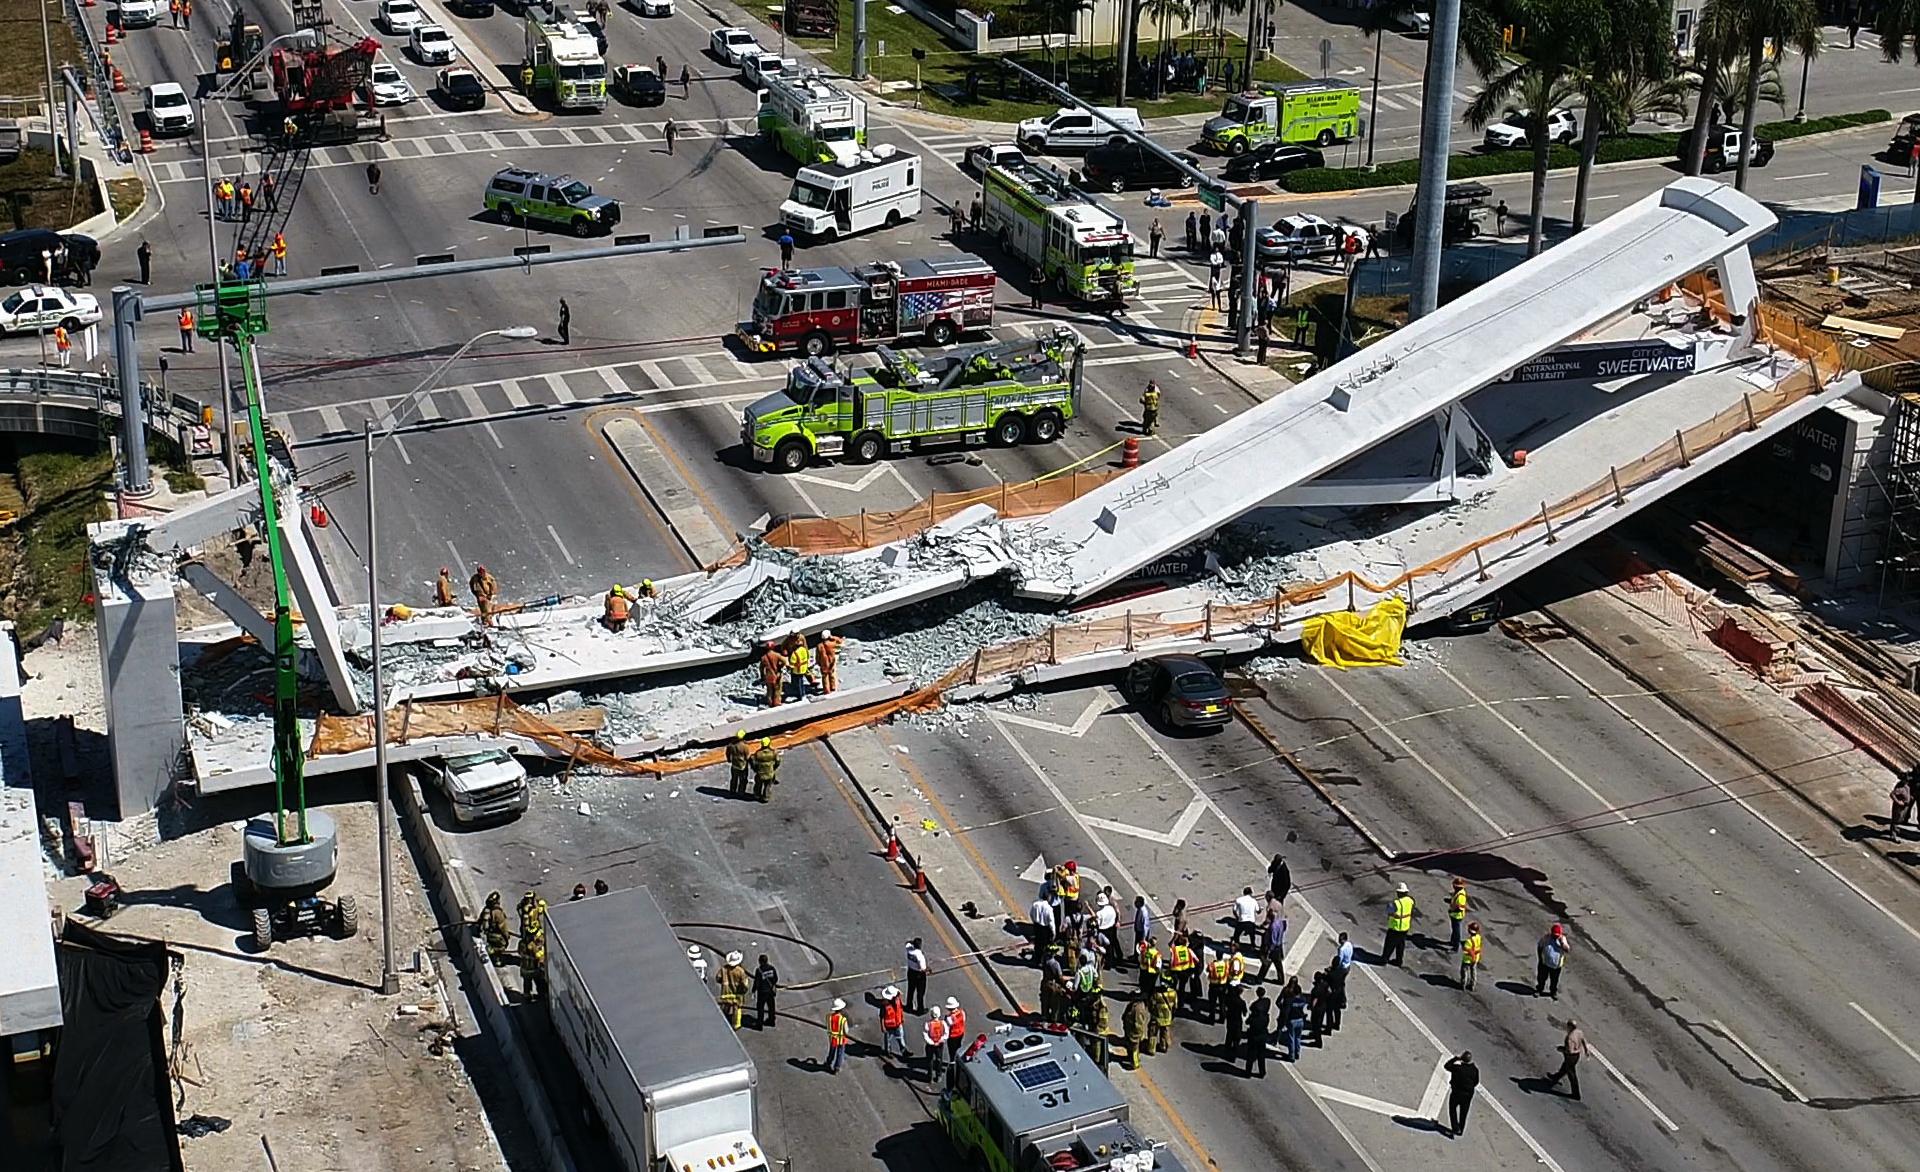 University_Bridge_Collapse_71939-159532.jpg27000298